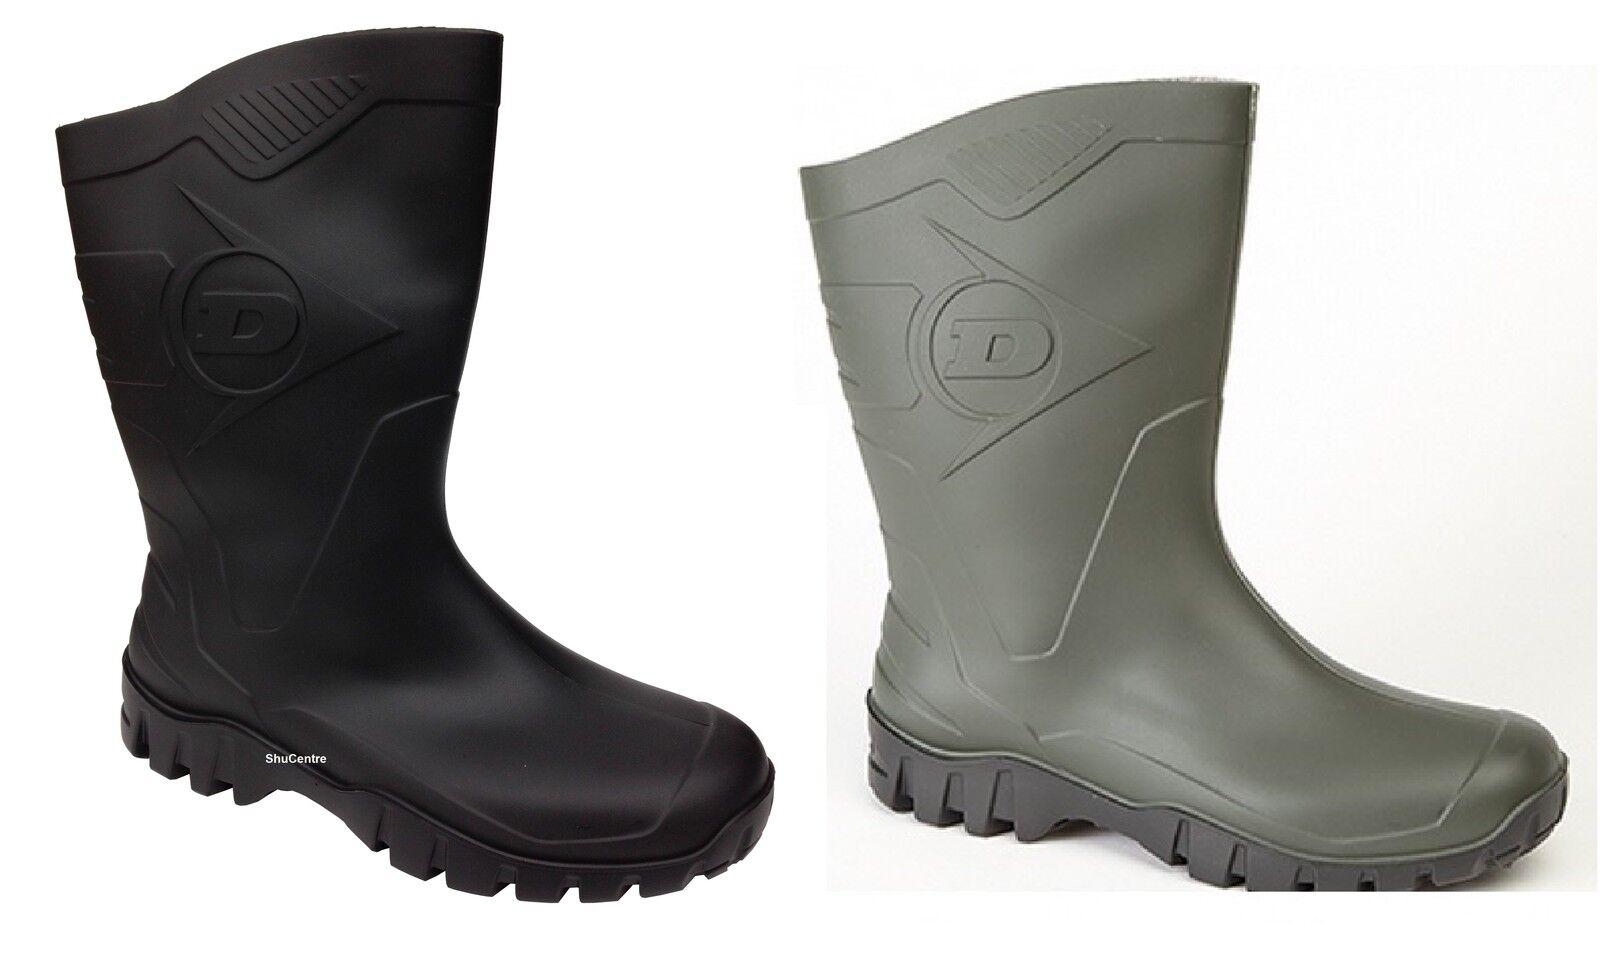 Dunlop HEVEA Unisex Welly Wellington Half Length Wide Calf Wellington Welly Boots Wellies Black 013ef1